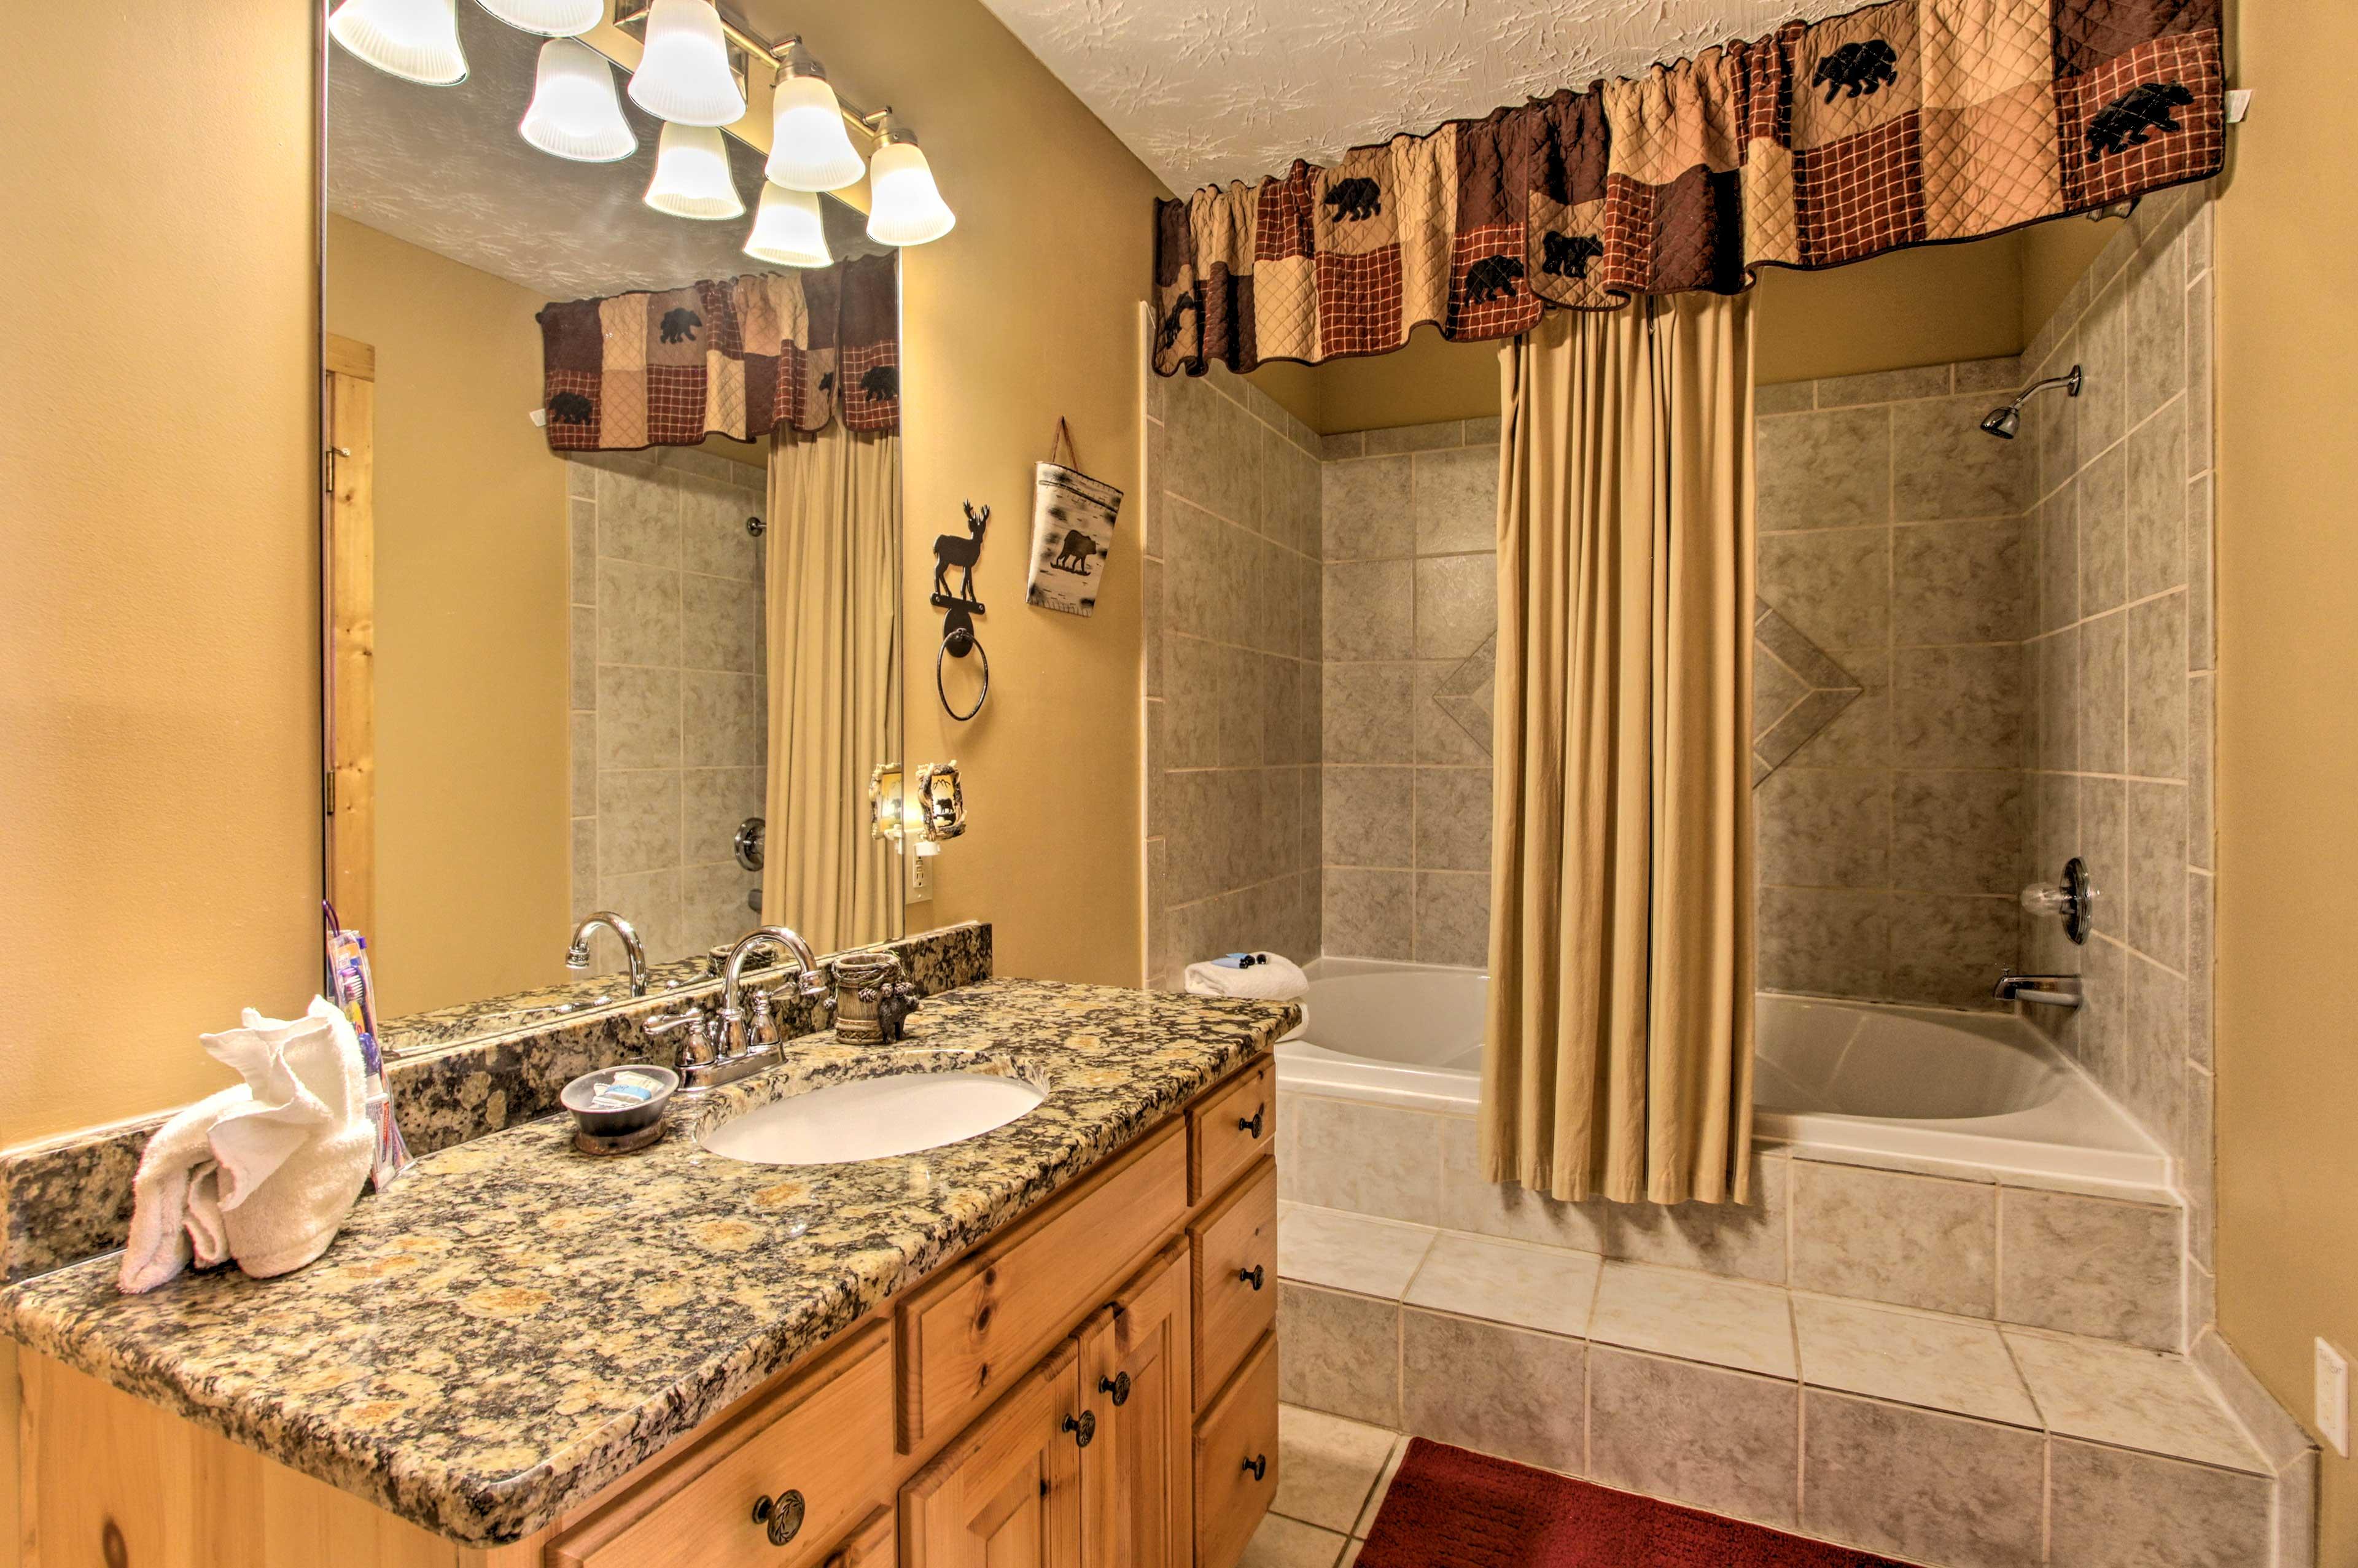 Rinse off in this pristine full bathroom.